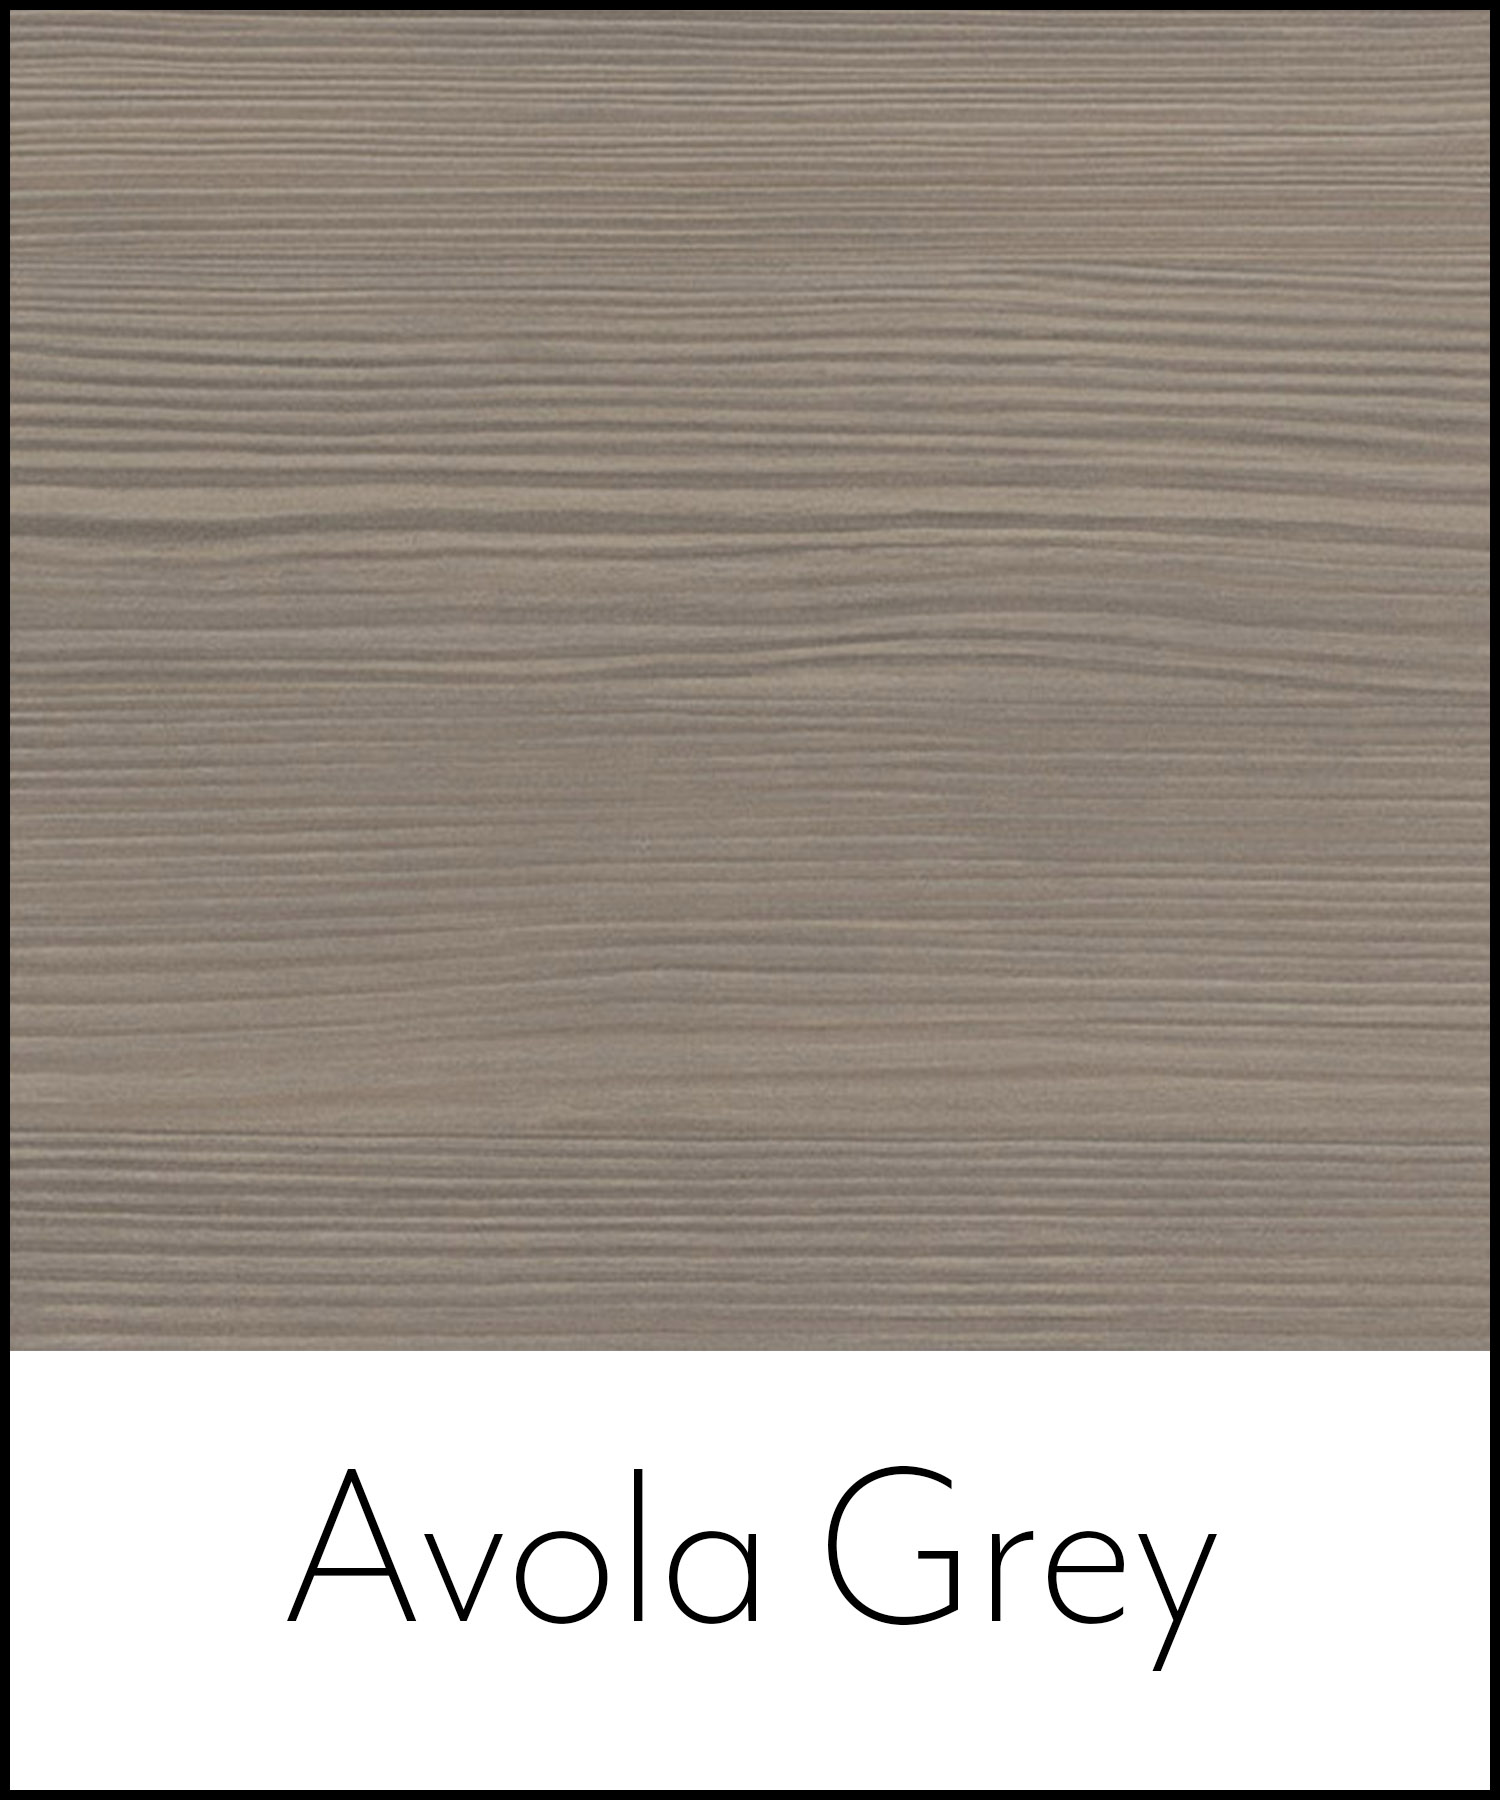 Avola Grey.jpg